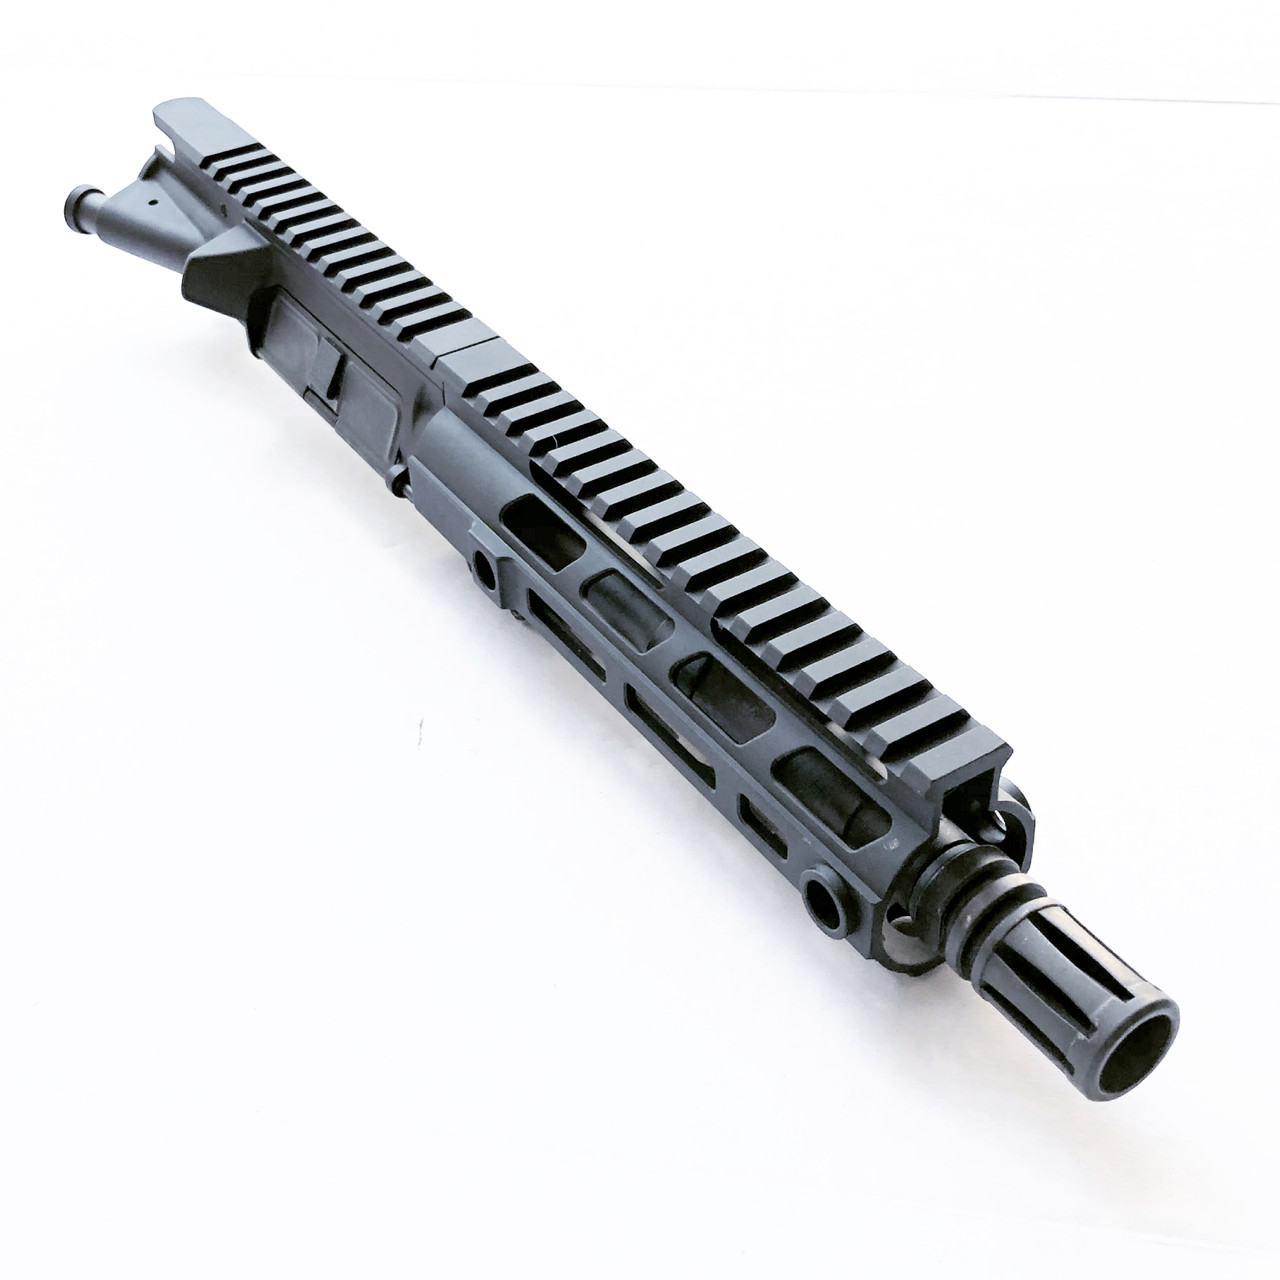 AR-15 Pistol Upper, .223 Wylde, 7.5'' Barrel, 1:7 Twist, Pistol Gas System